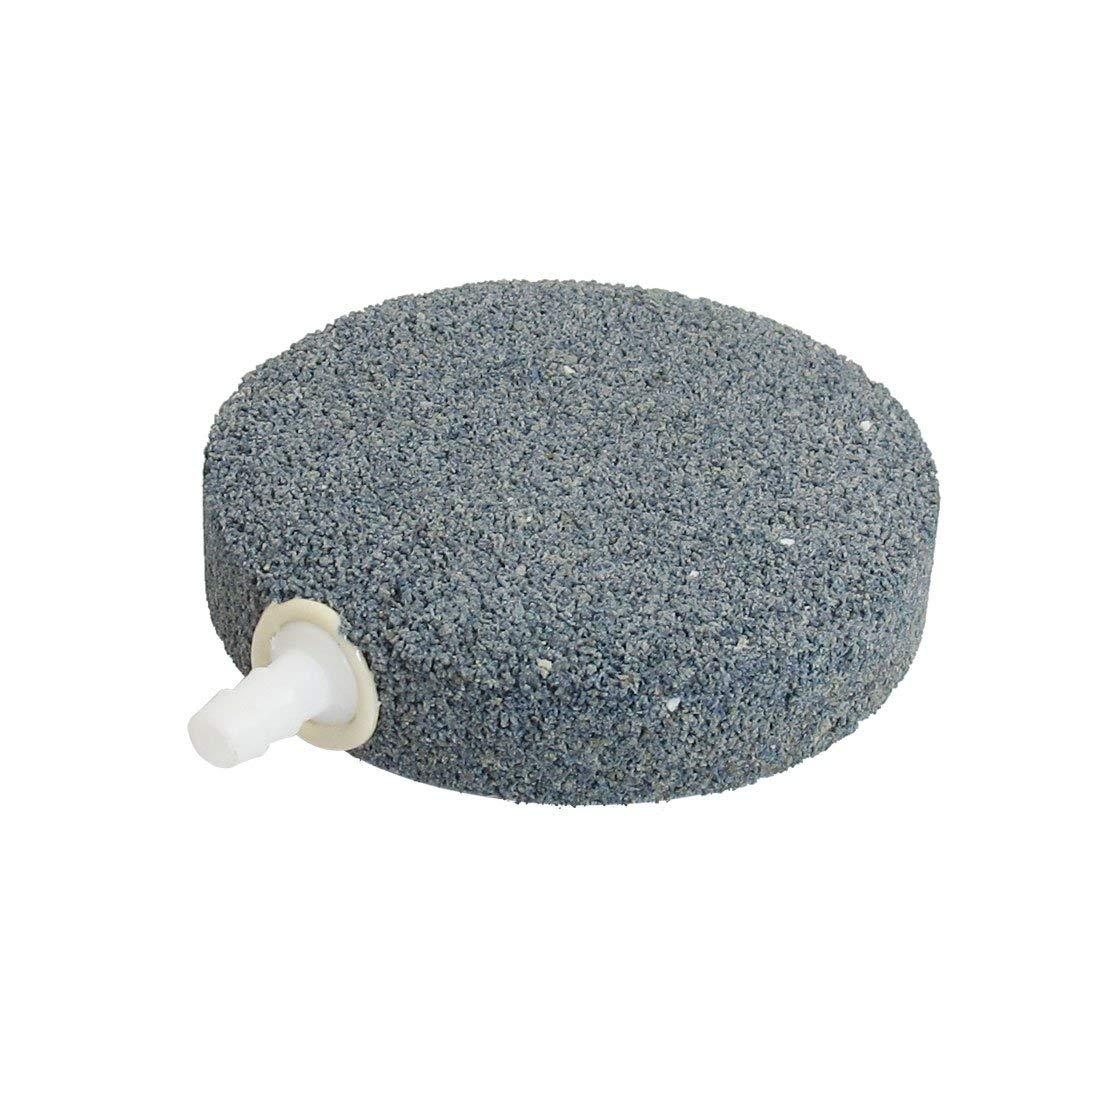 Uxcell Round Aquarium Mineral Sintered Air Stone/Airstone, 97mm